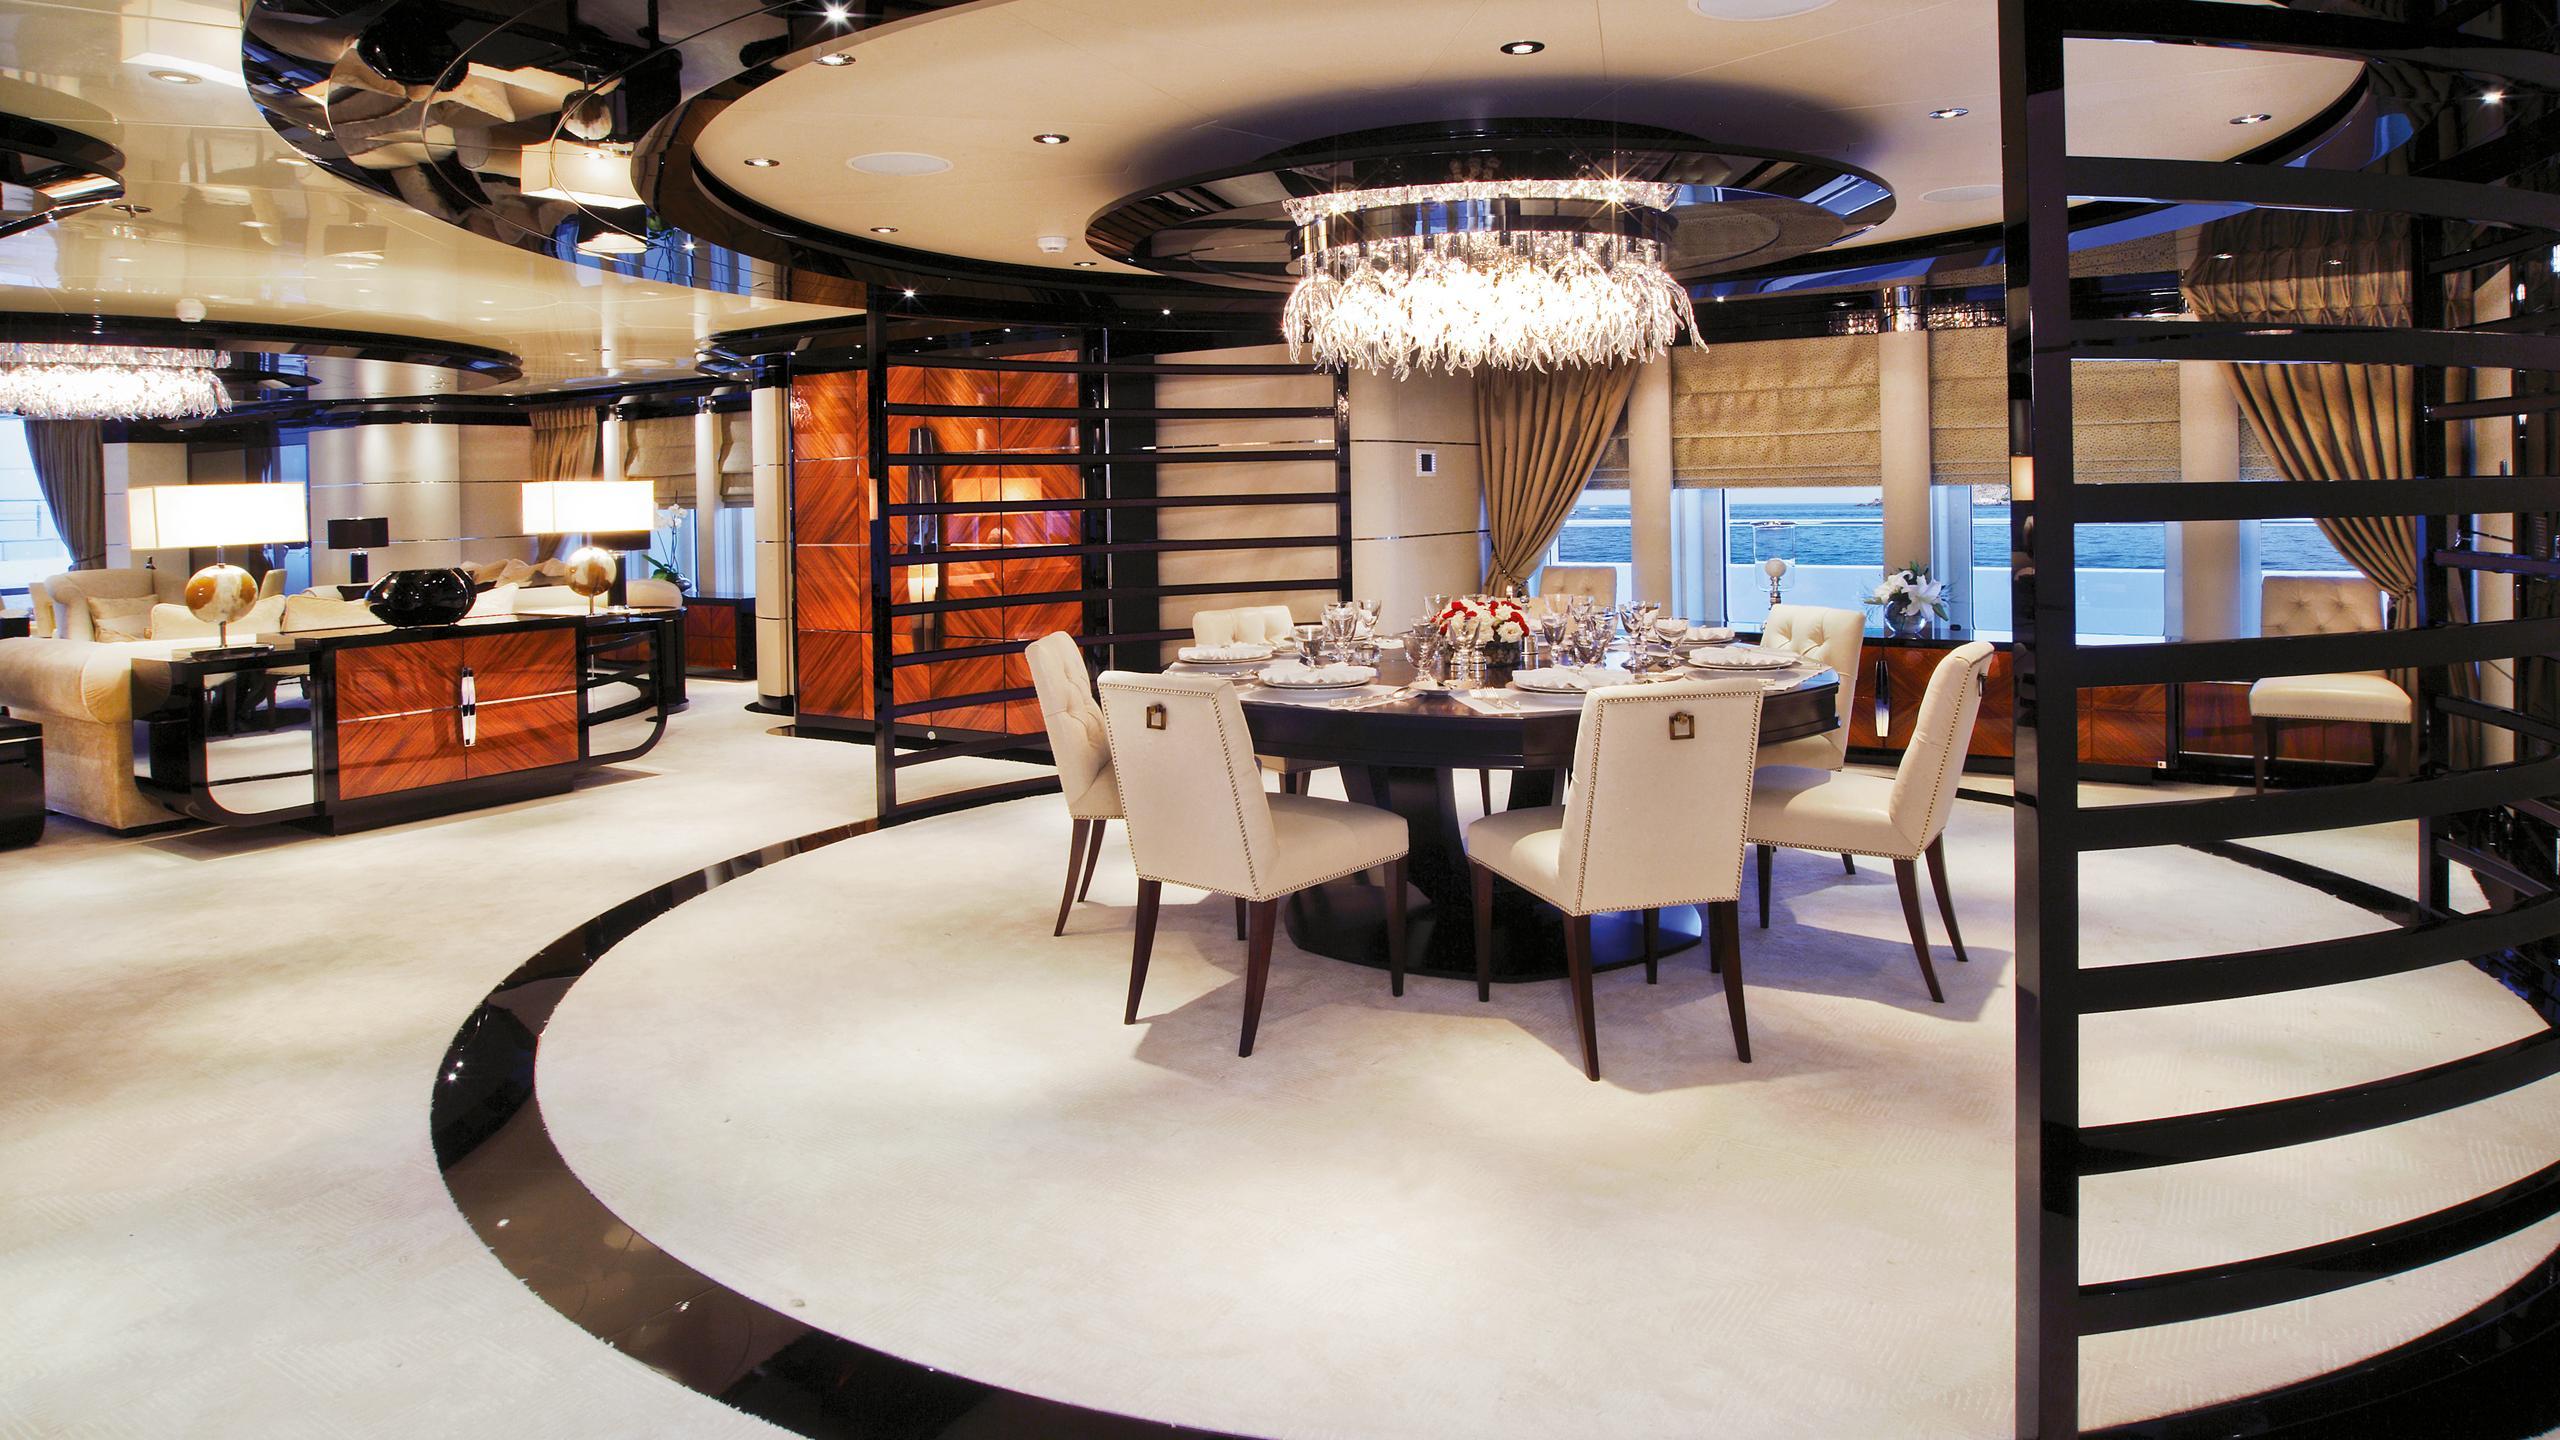 talisman-c-motor-yacht-Turquoise-2011-71m-dining-saloon